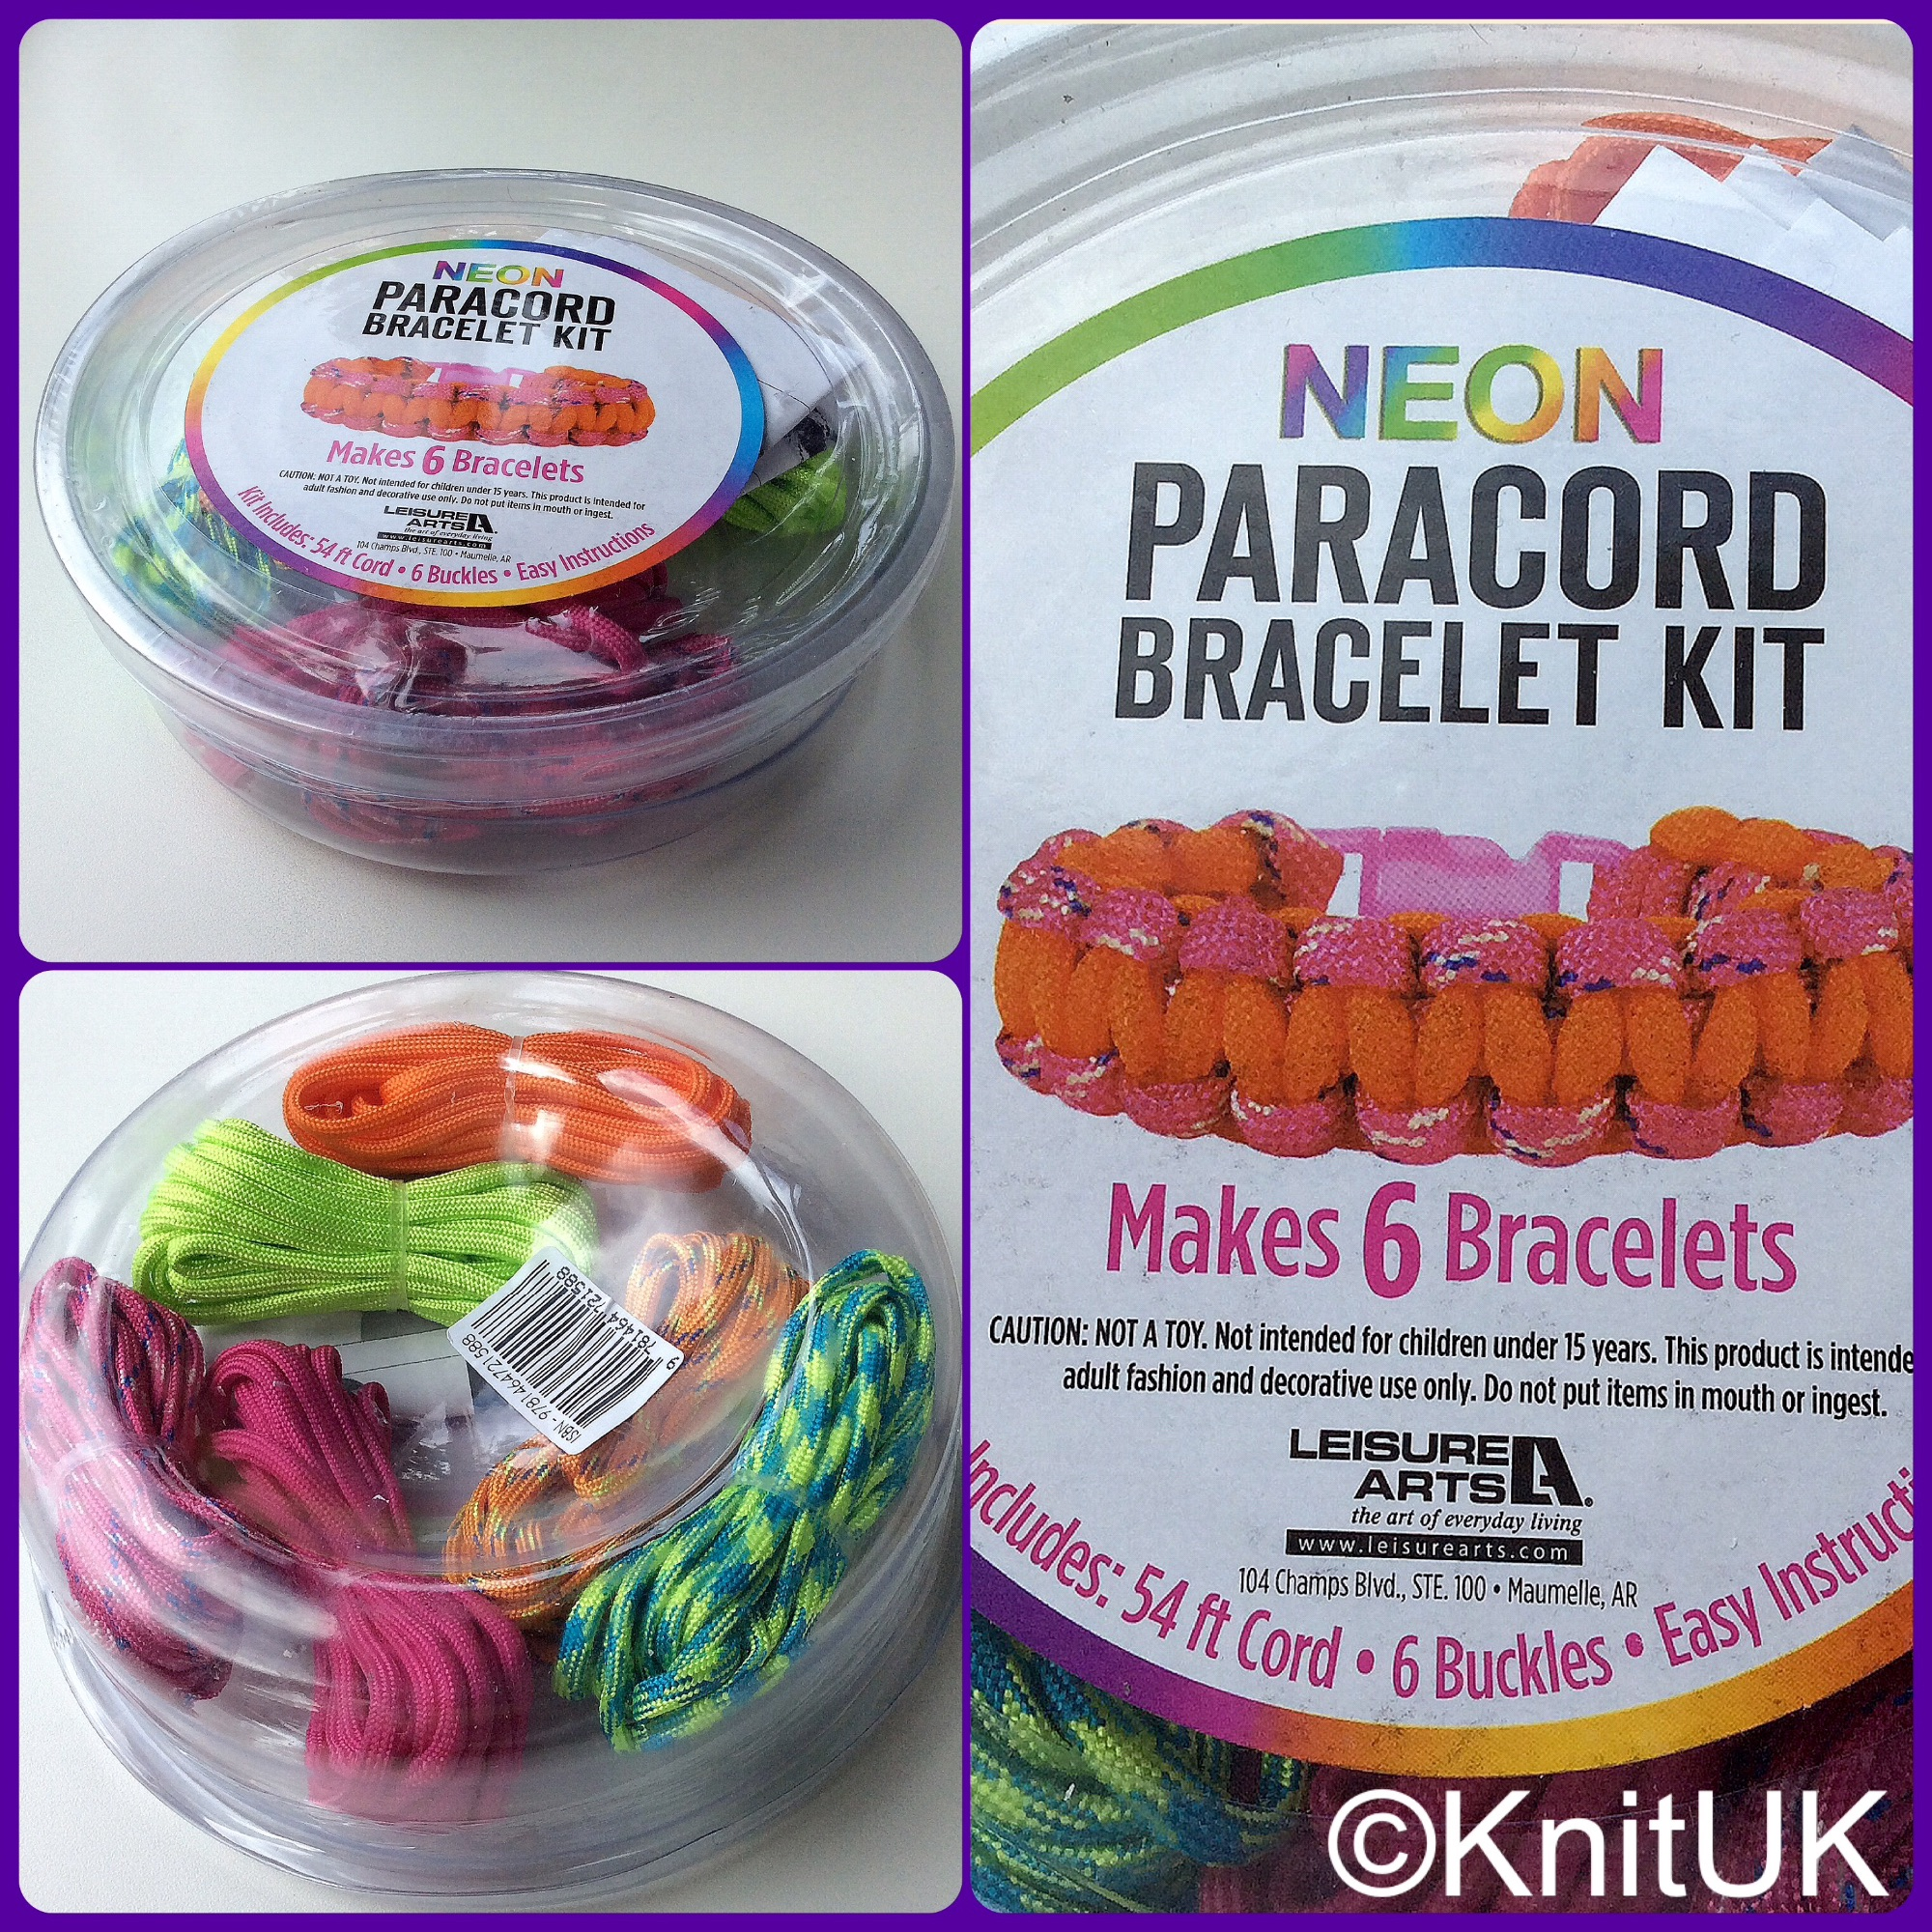 Leisure arts paracord bracelet kit neon pink